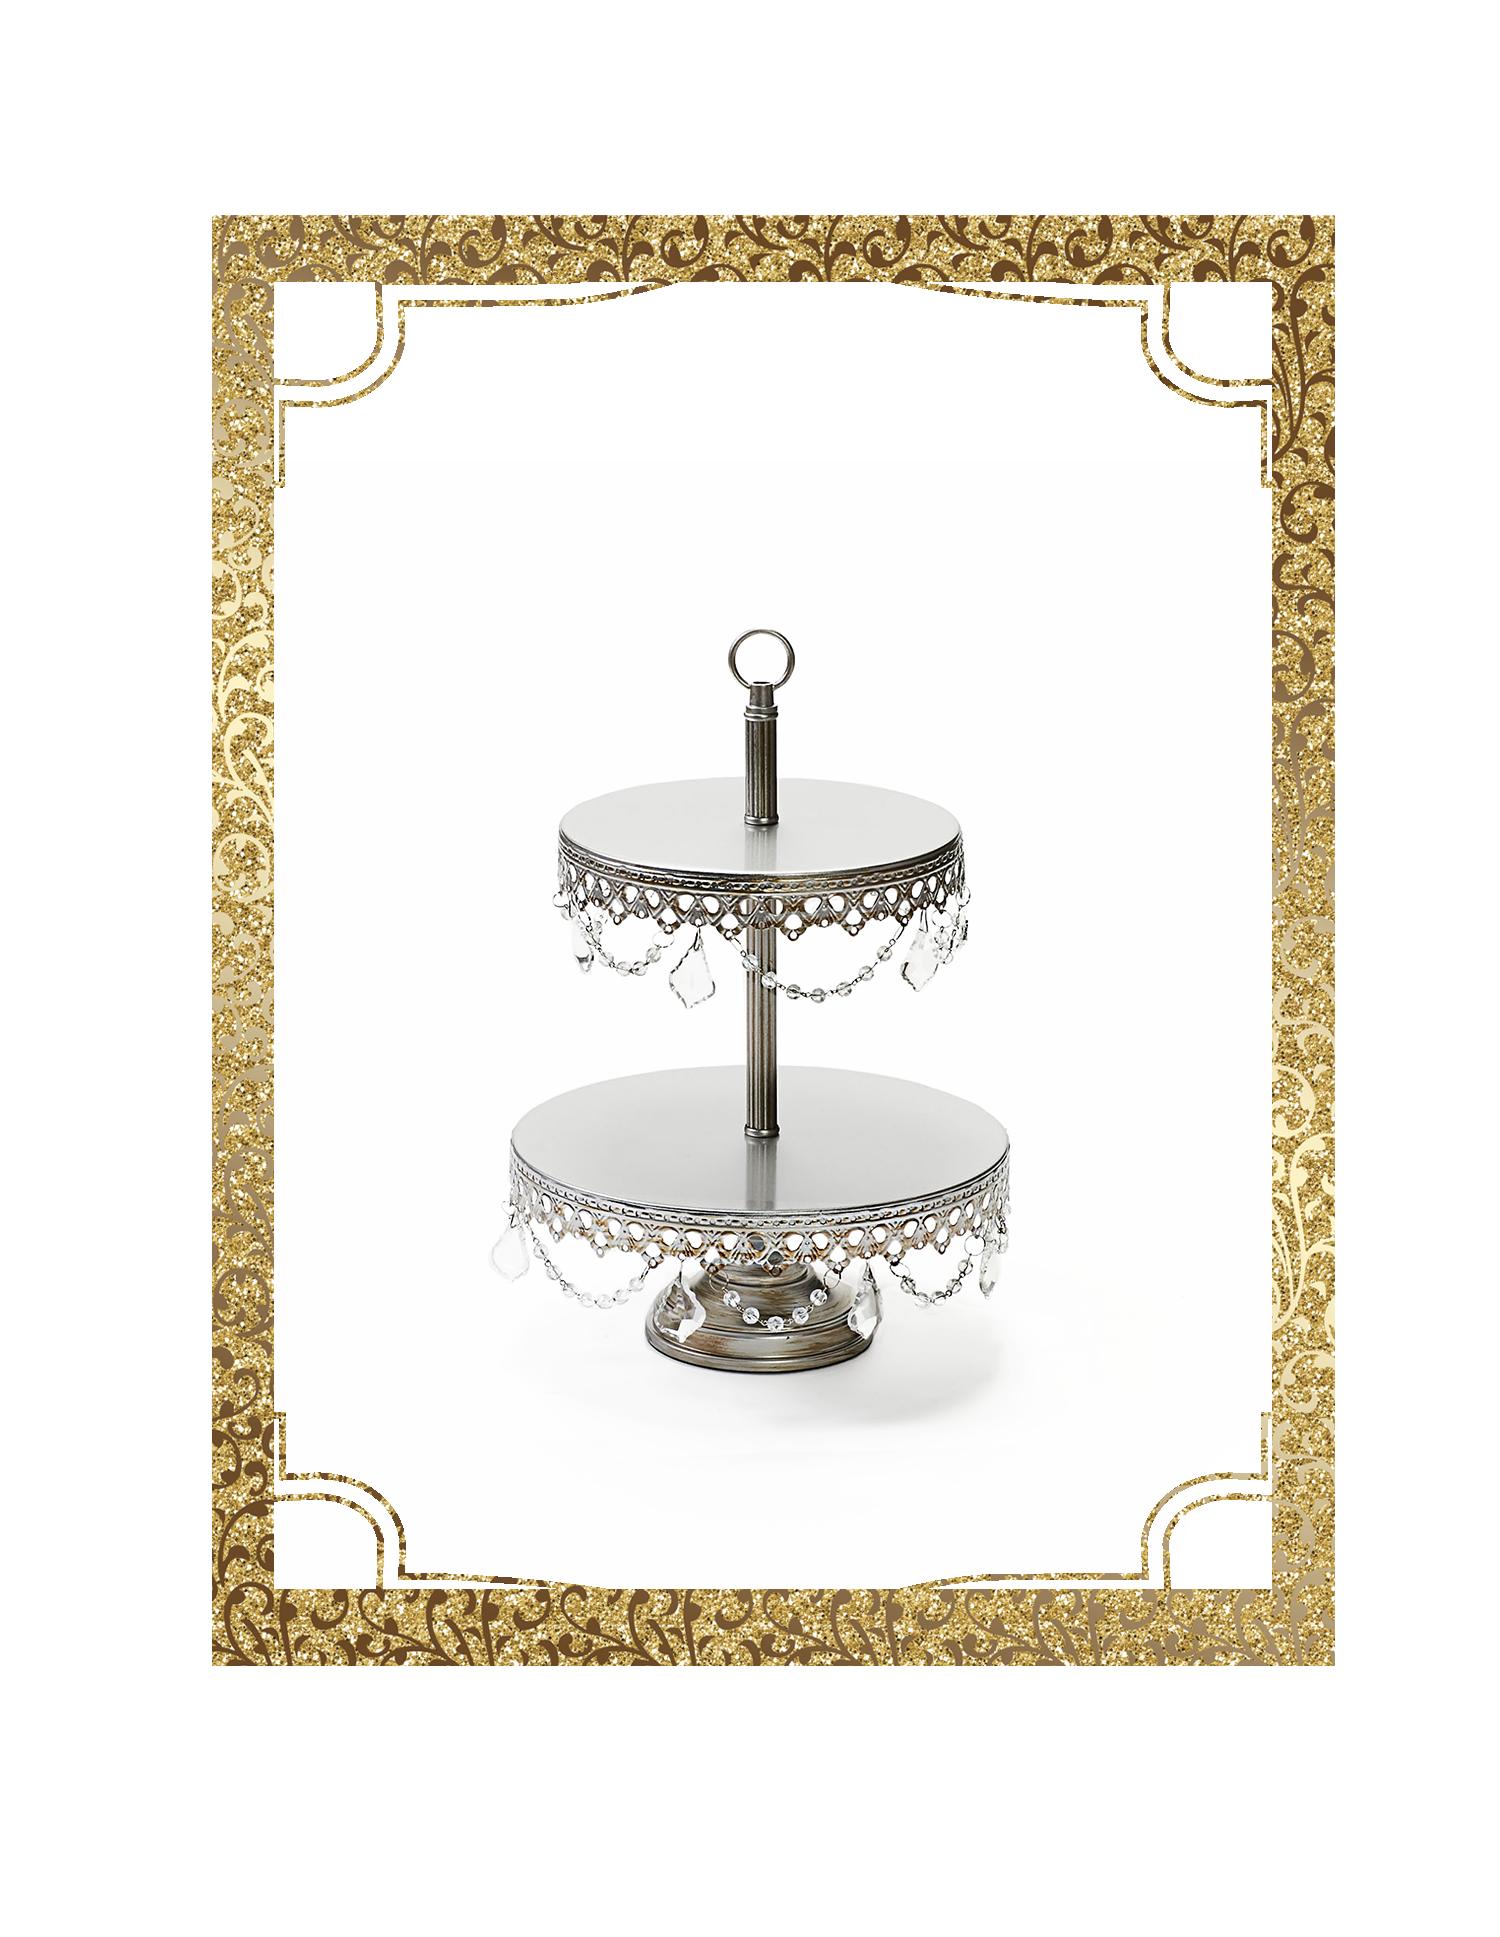 SHOP-preview ANTIQUE SILVER 2tier chandelier dessert stand.png